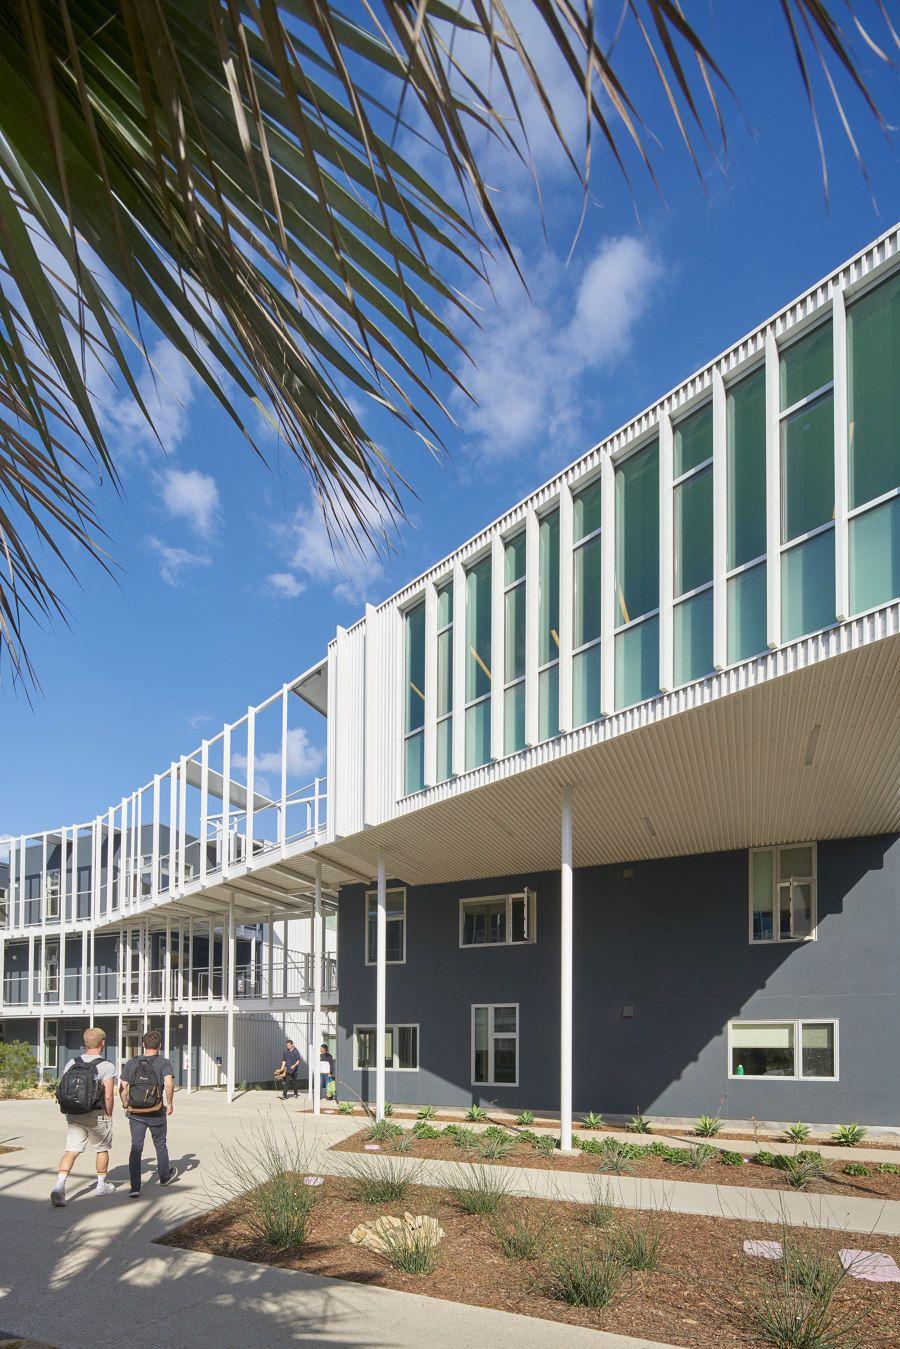 Ucsb San Joaquin Student Housing By Loha Lorcan O Herlihy Architects Universities Student House Architect San Joaquin